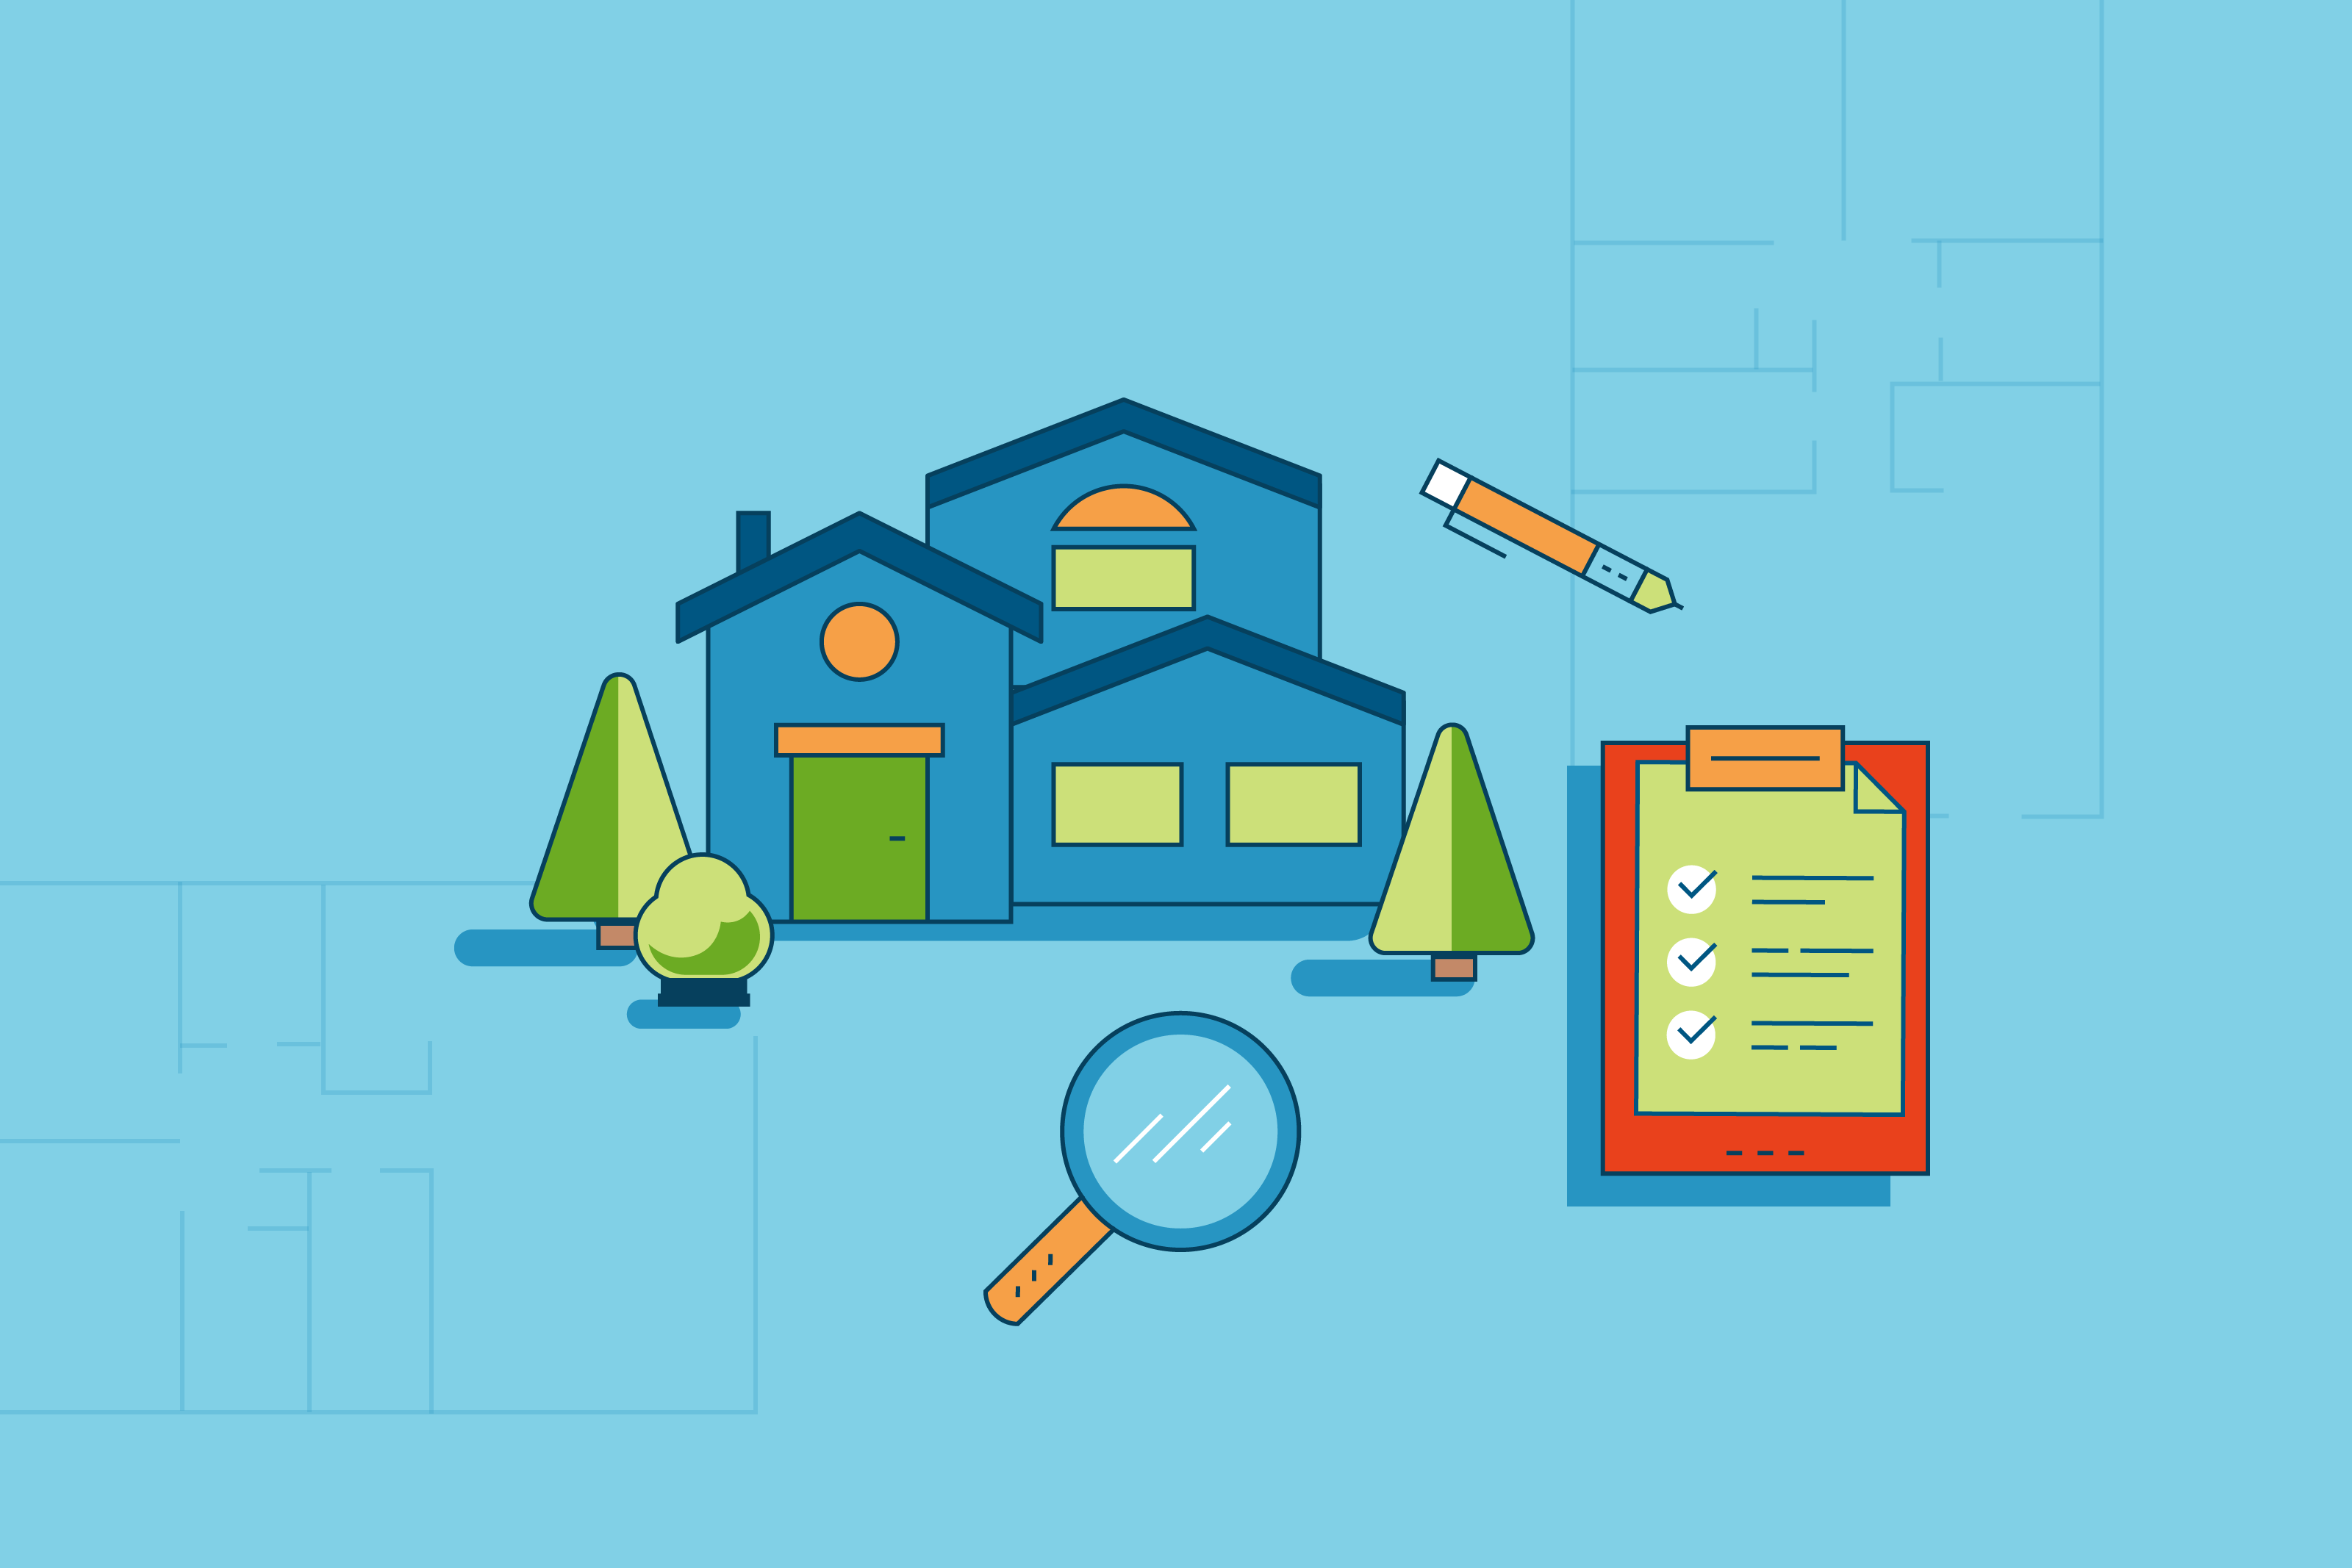 Home appraisal illustration